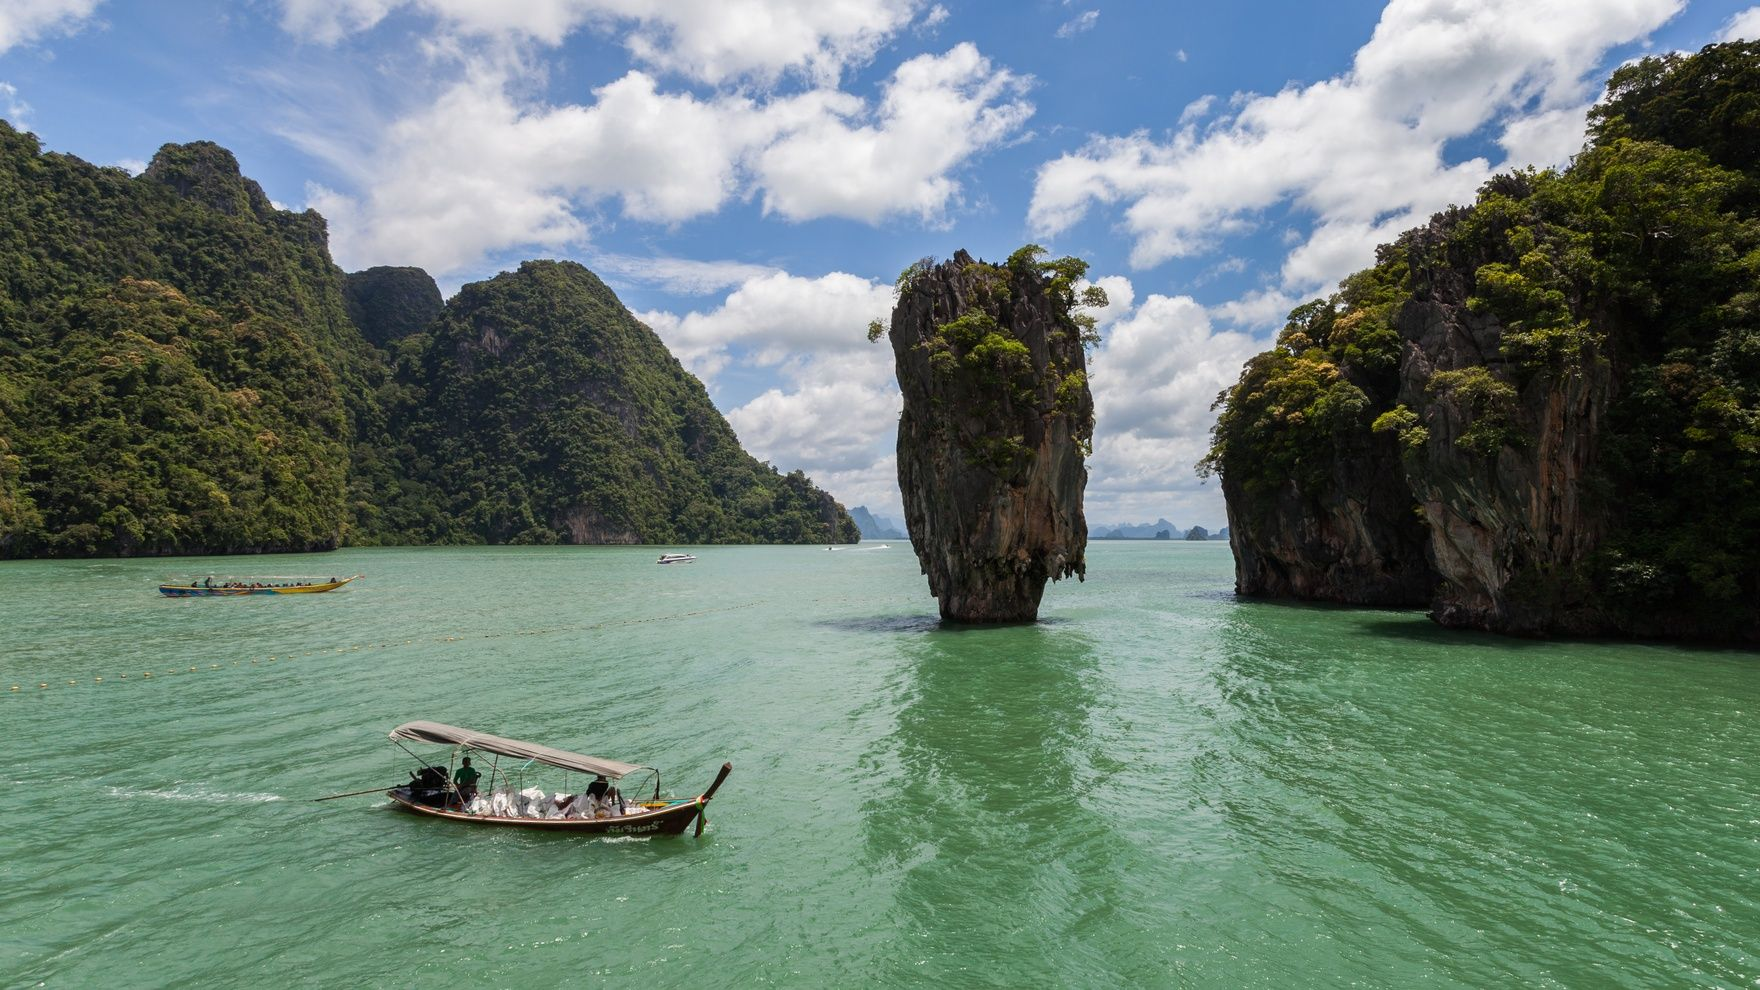 Круиз на каникулы по островам Таиланда